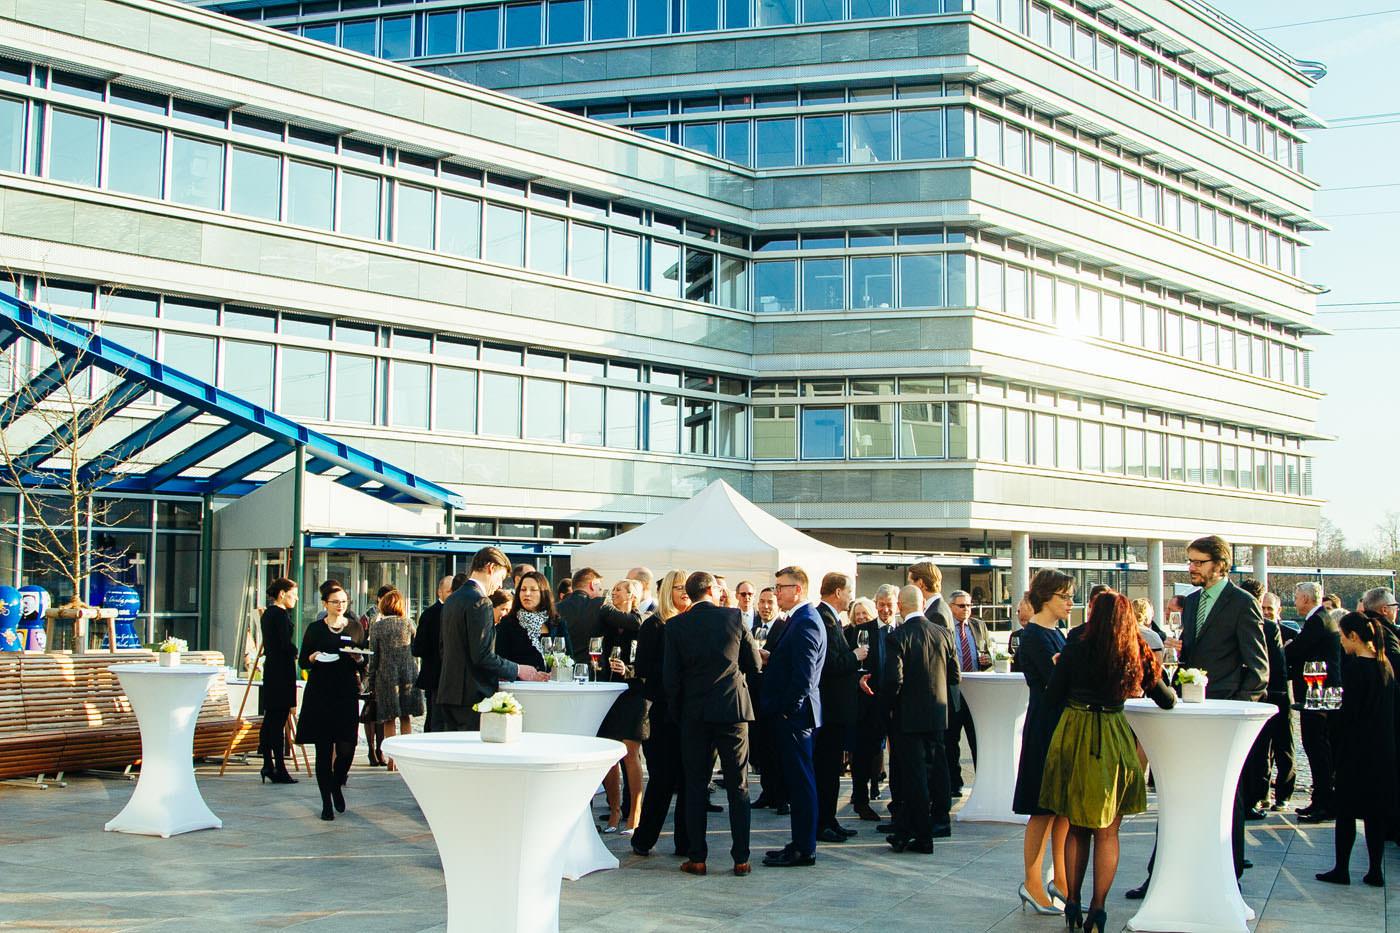 Events, Gala, Veranstaltung, Stehempfang,, Ravensburger, Agentur Ravensburger